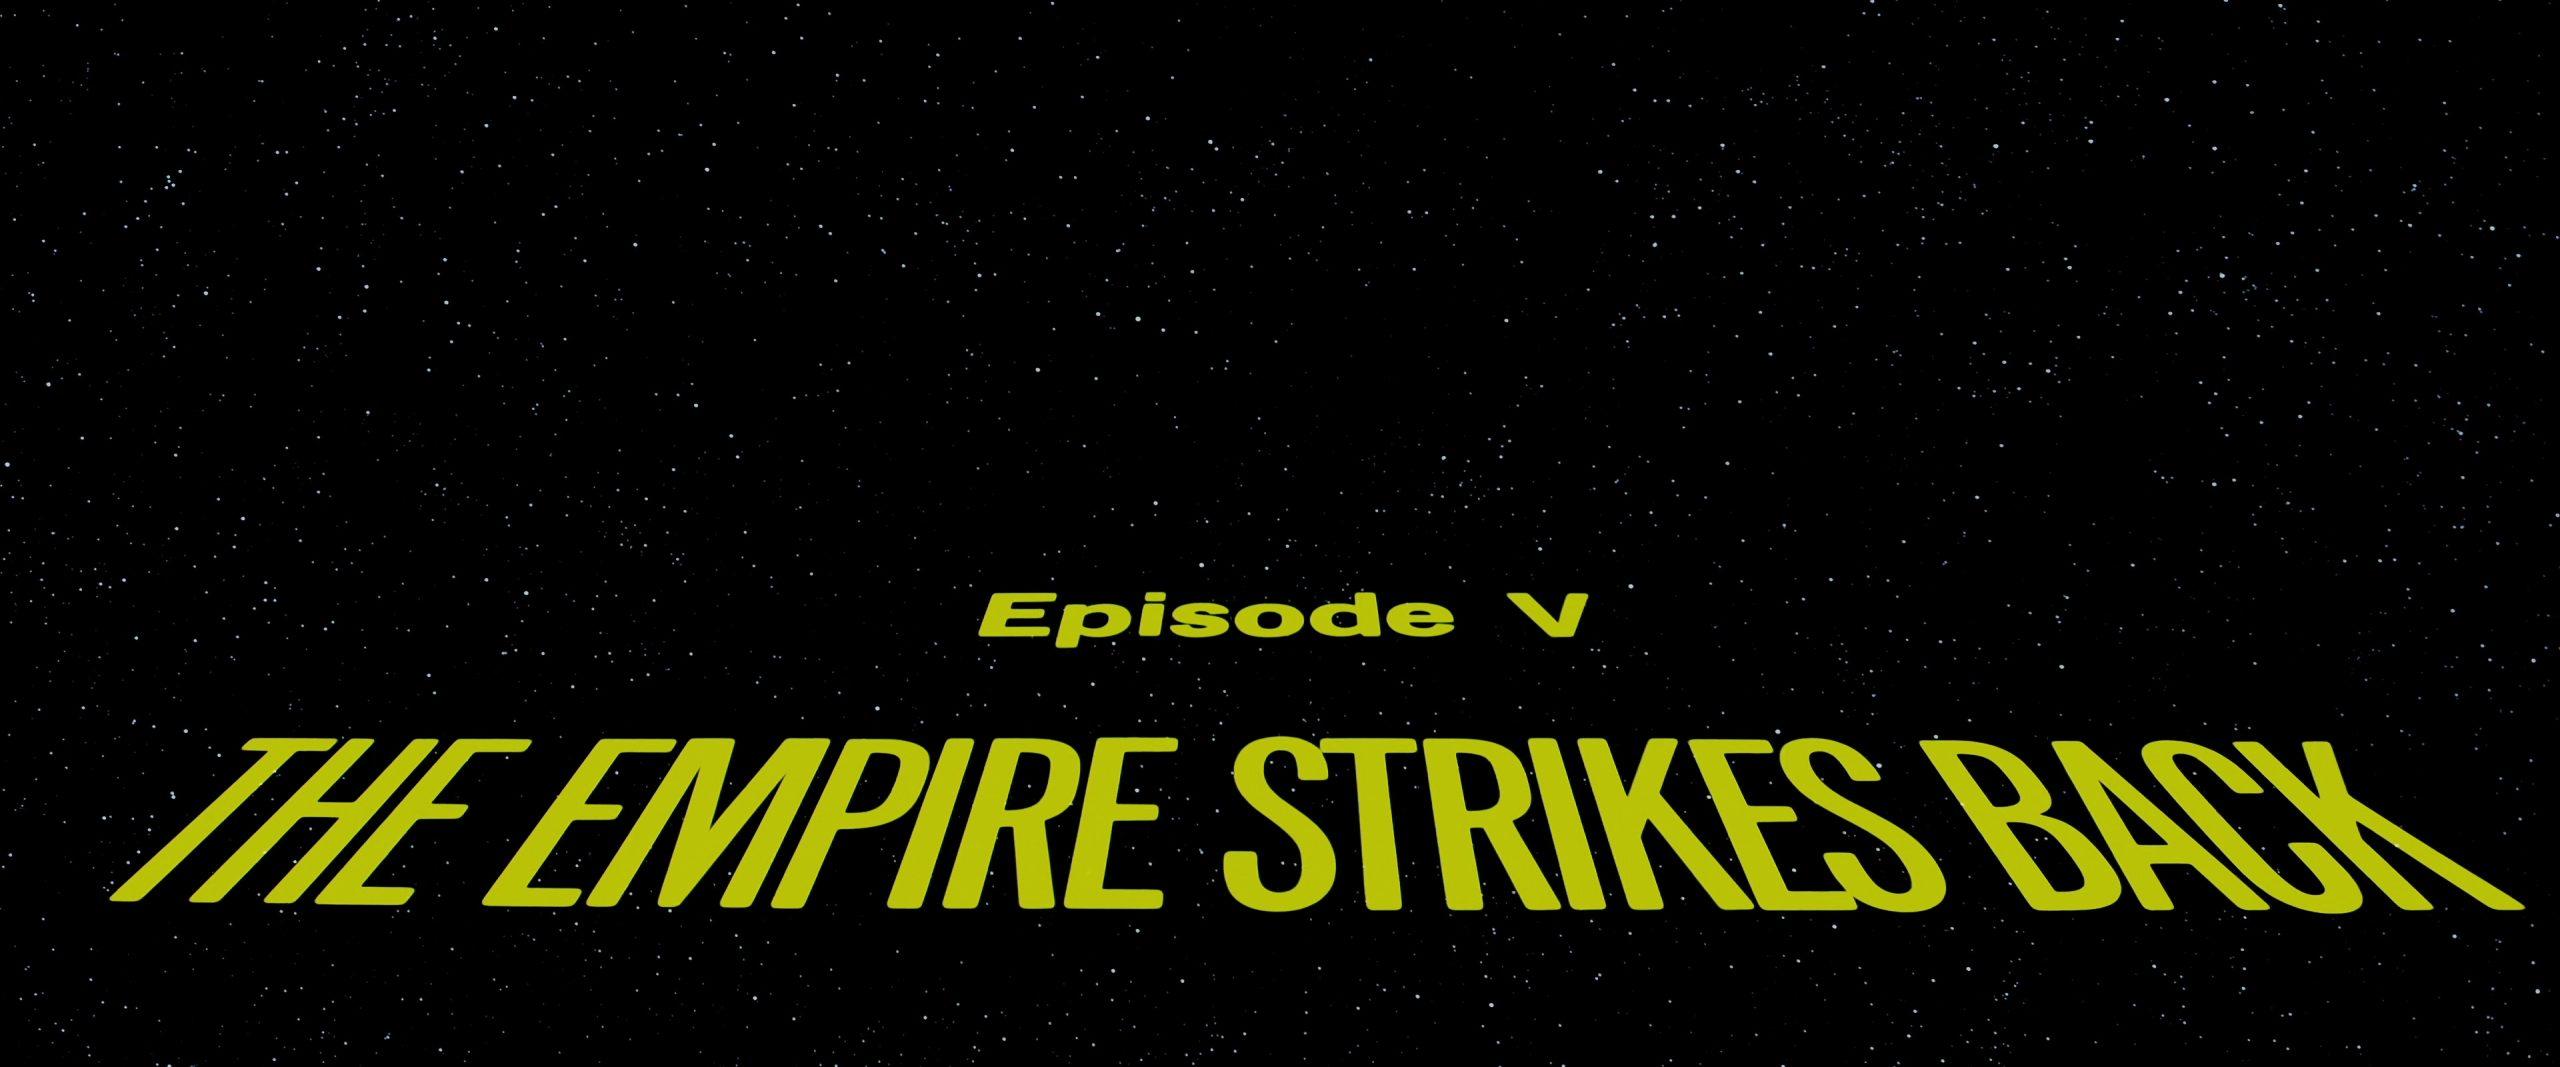 4k Star Wars Episode V The Empire Strikes Back 1980 Starwars Screencaps Com